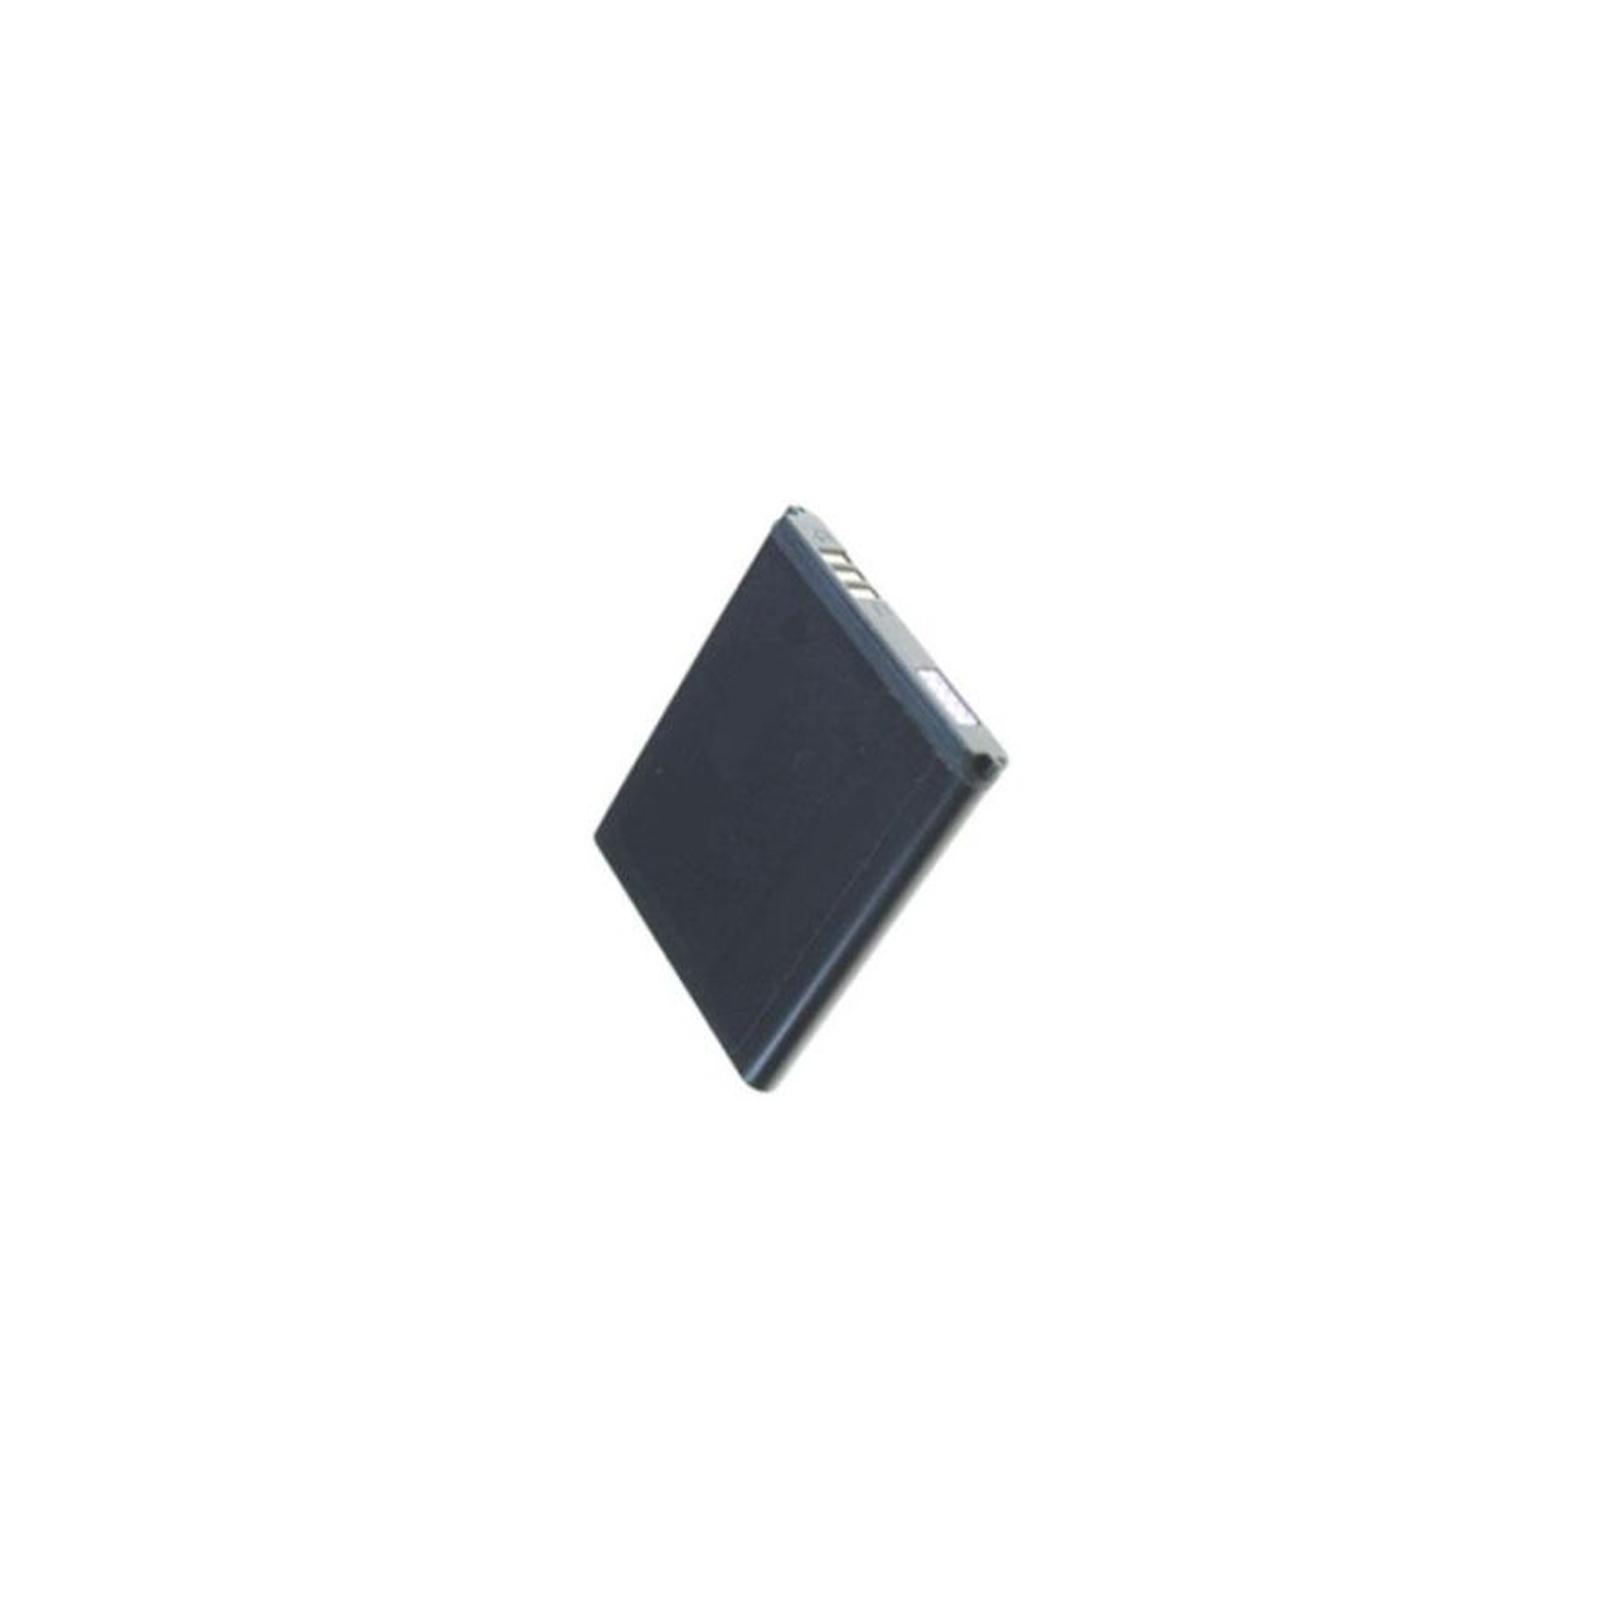 Аккумуляторная батарея PowerPlant Samsung J608, M600 (DV00DV6047)